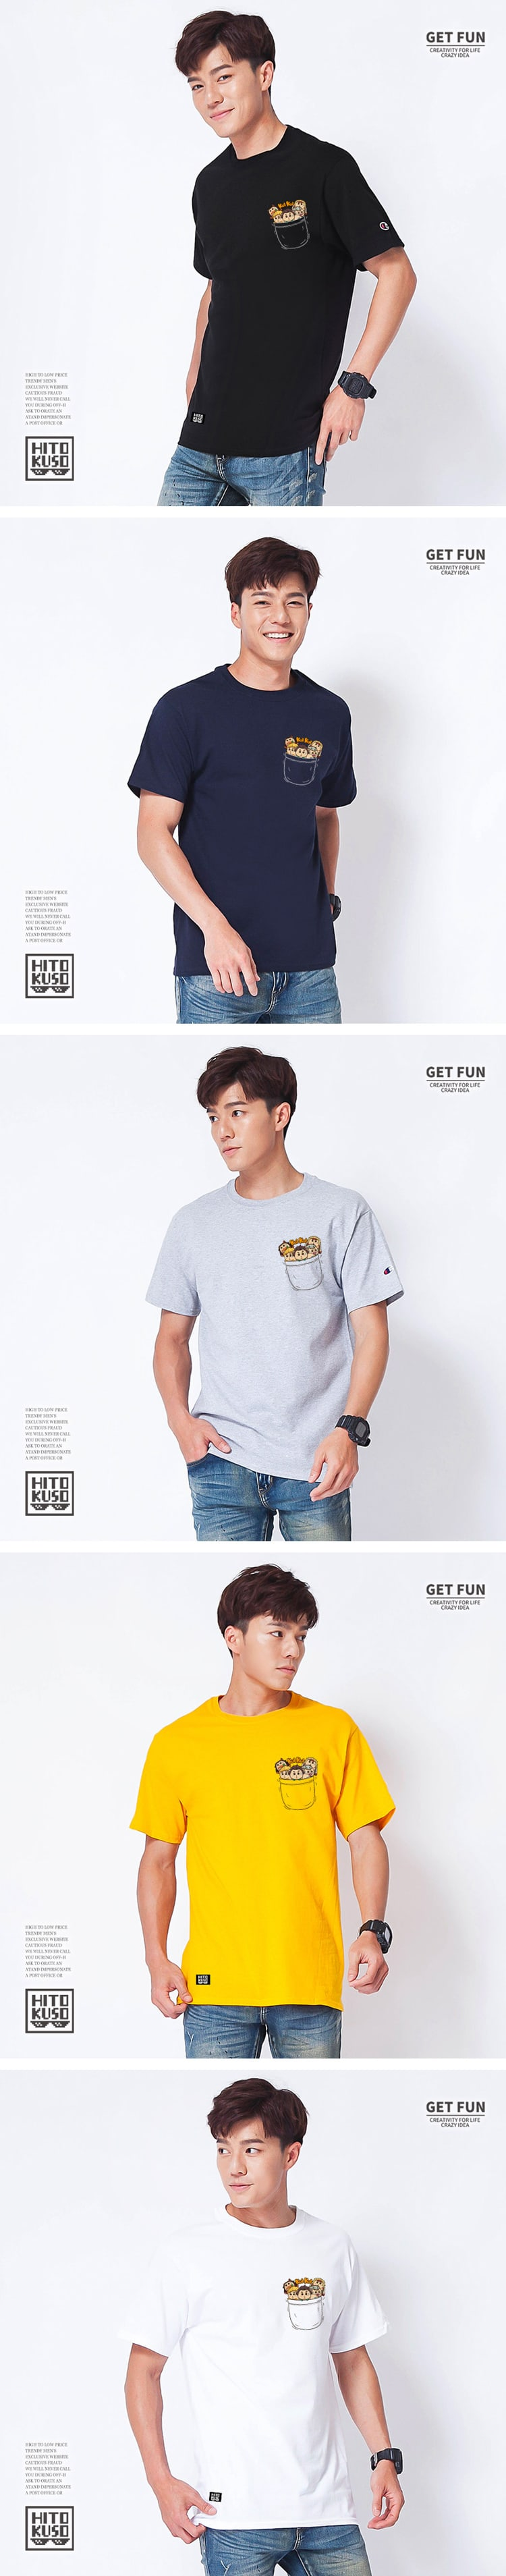 KUIKUI滅鬼豚豚假口袋設計短袖T恤